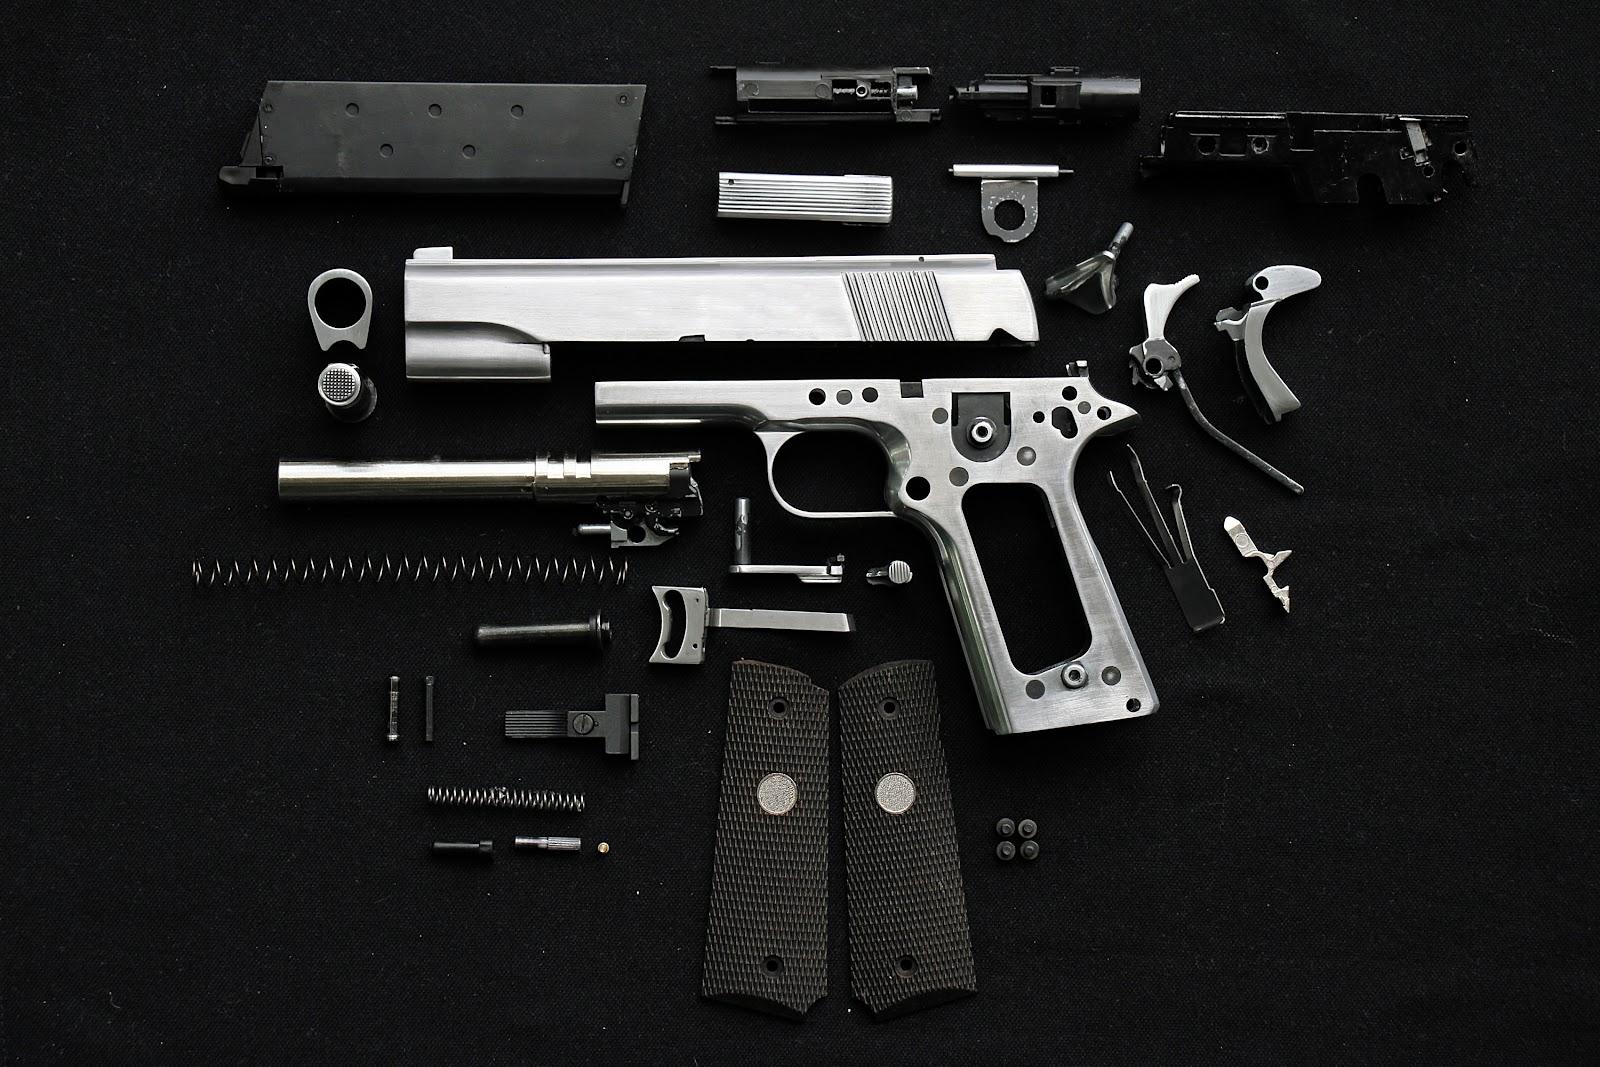 a full disassembled pistol